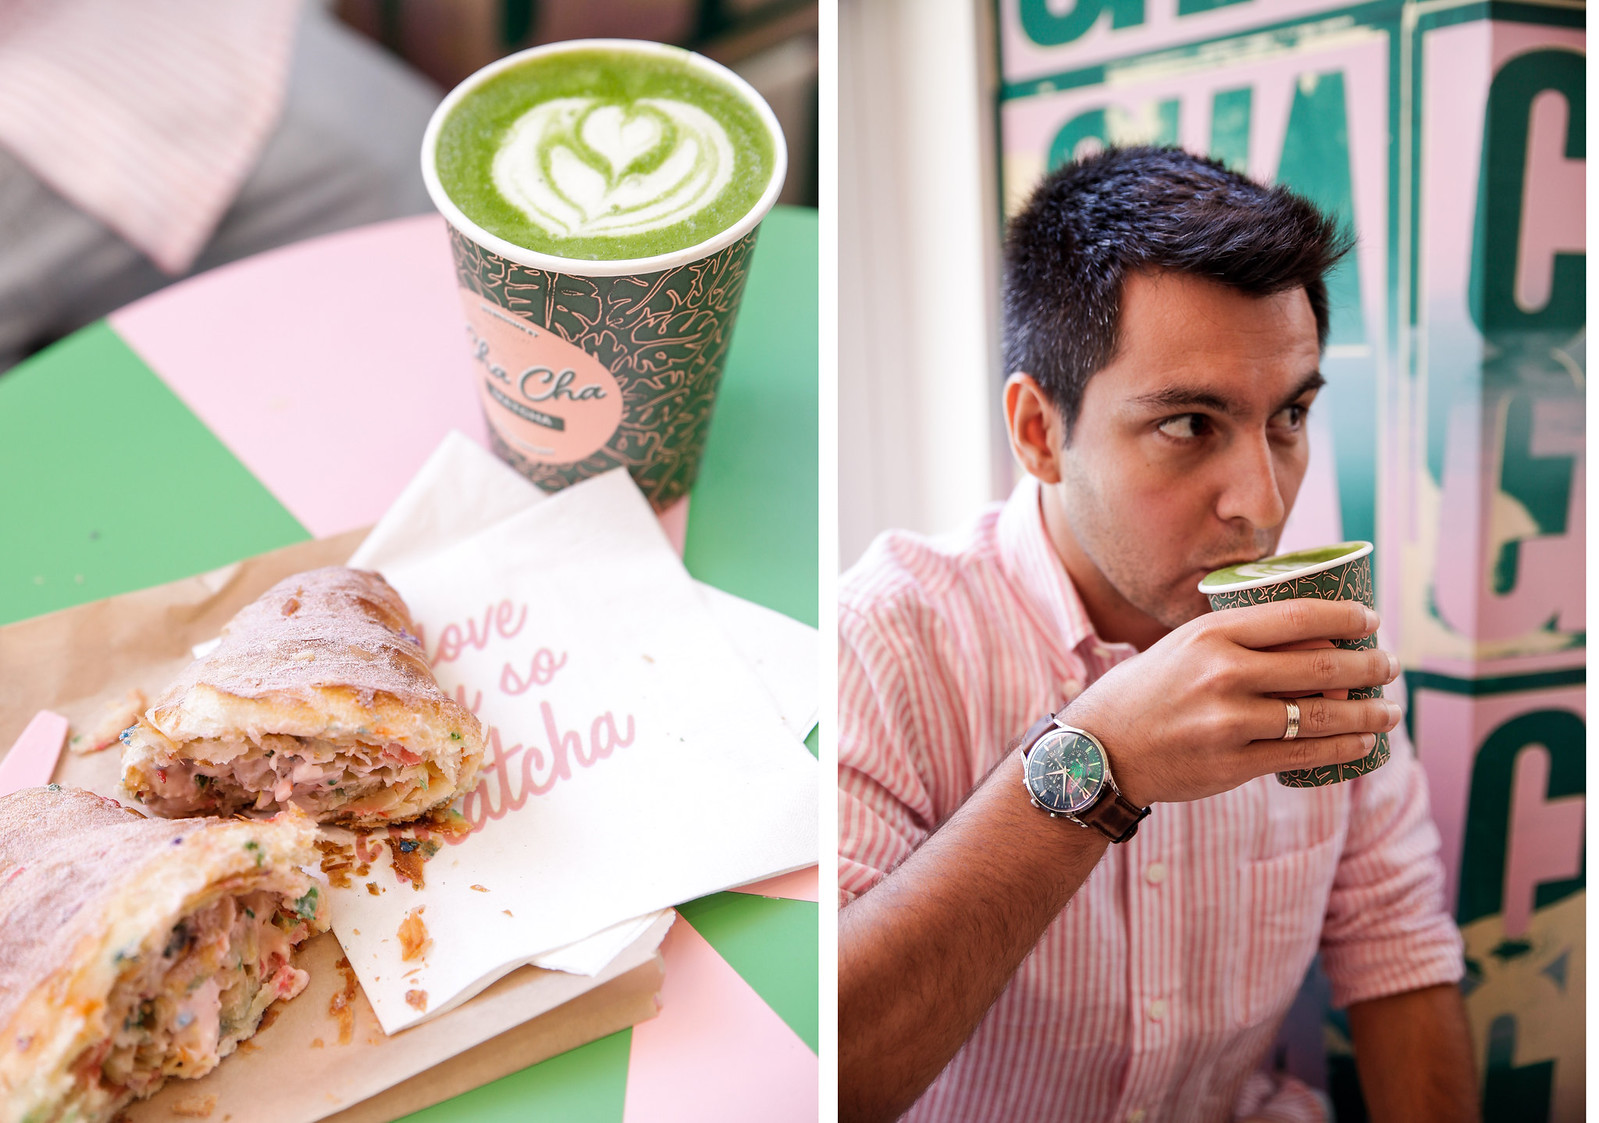 04_cha_cha_matcha_cafeteria_rosa_nueva_york_el_mejor_matcha_unicorn_croissant_breakfast_theguestgirl_nyc